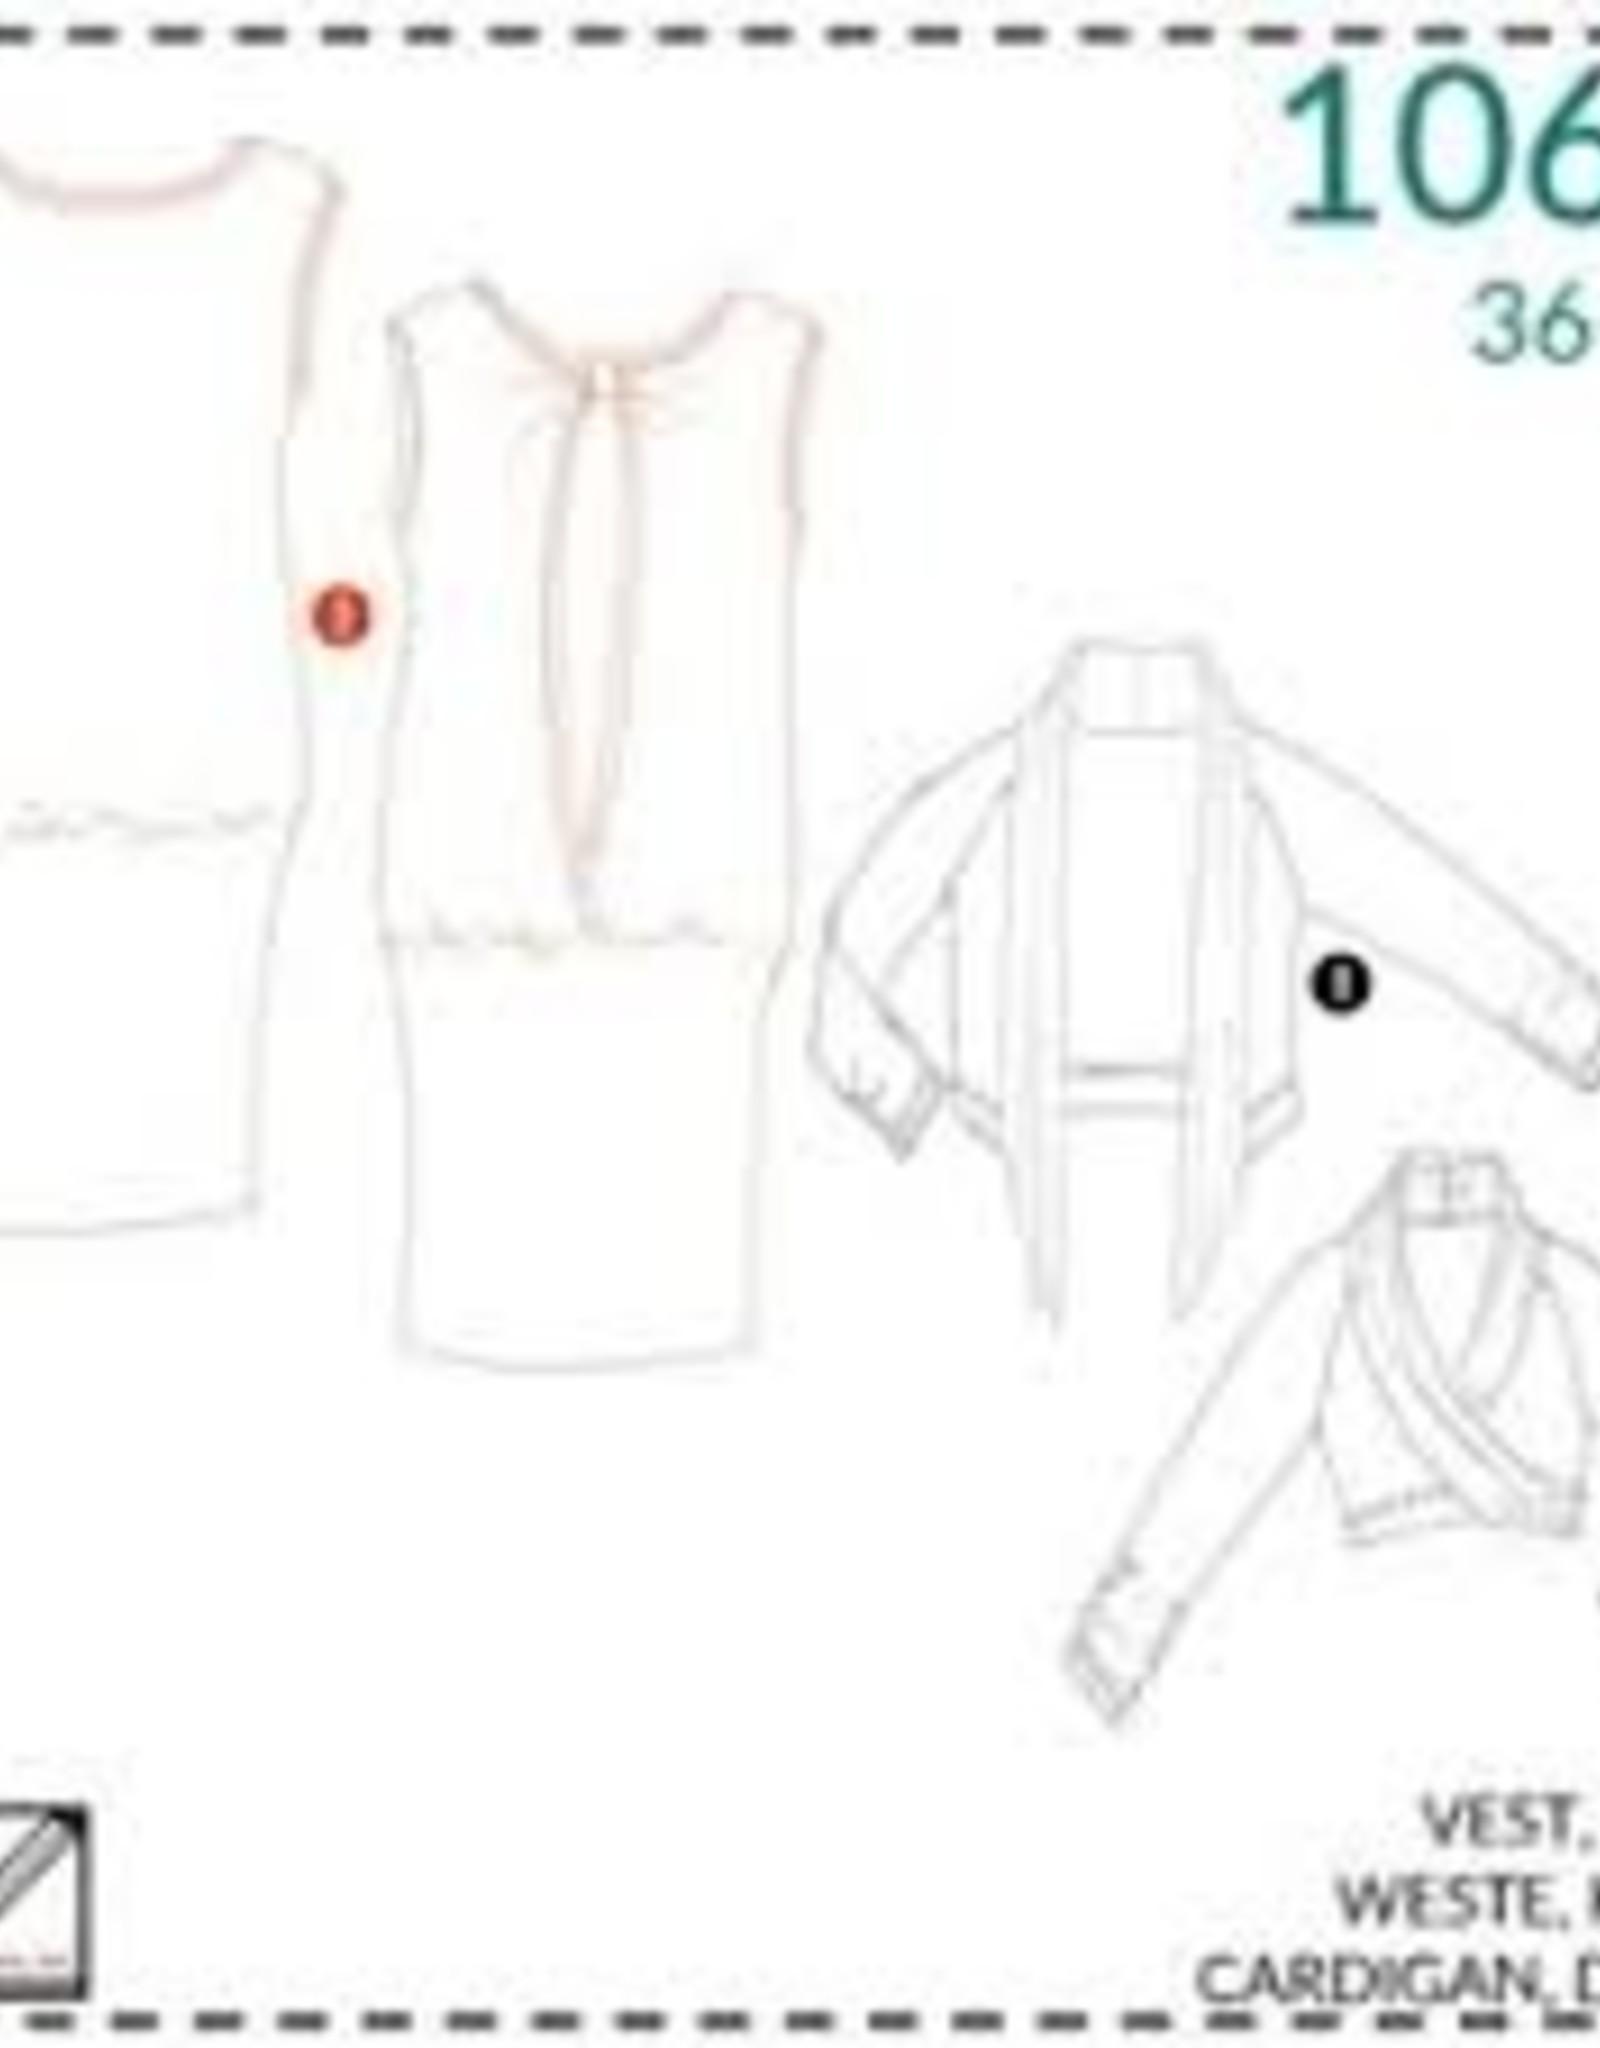 It's A fits jurk en vest 1068 - It's A fits